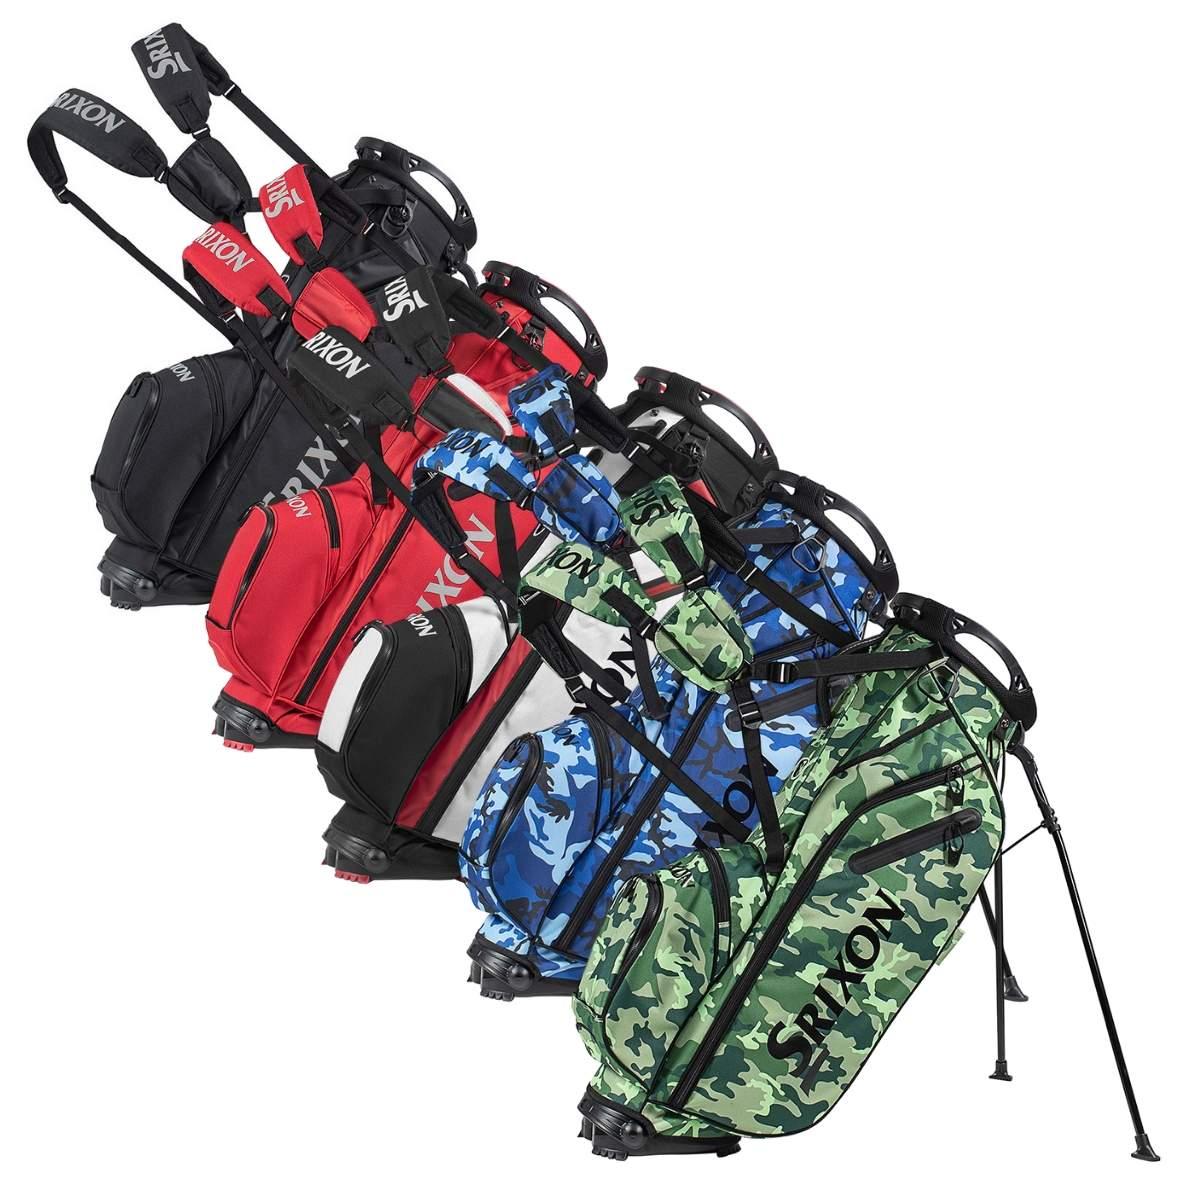 Srixon Z85 Stand Bag